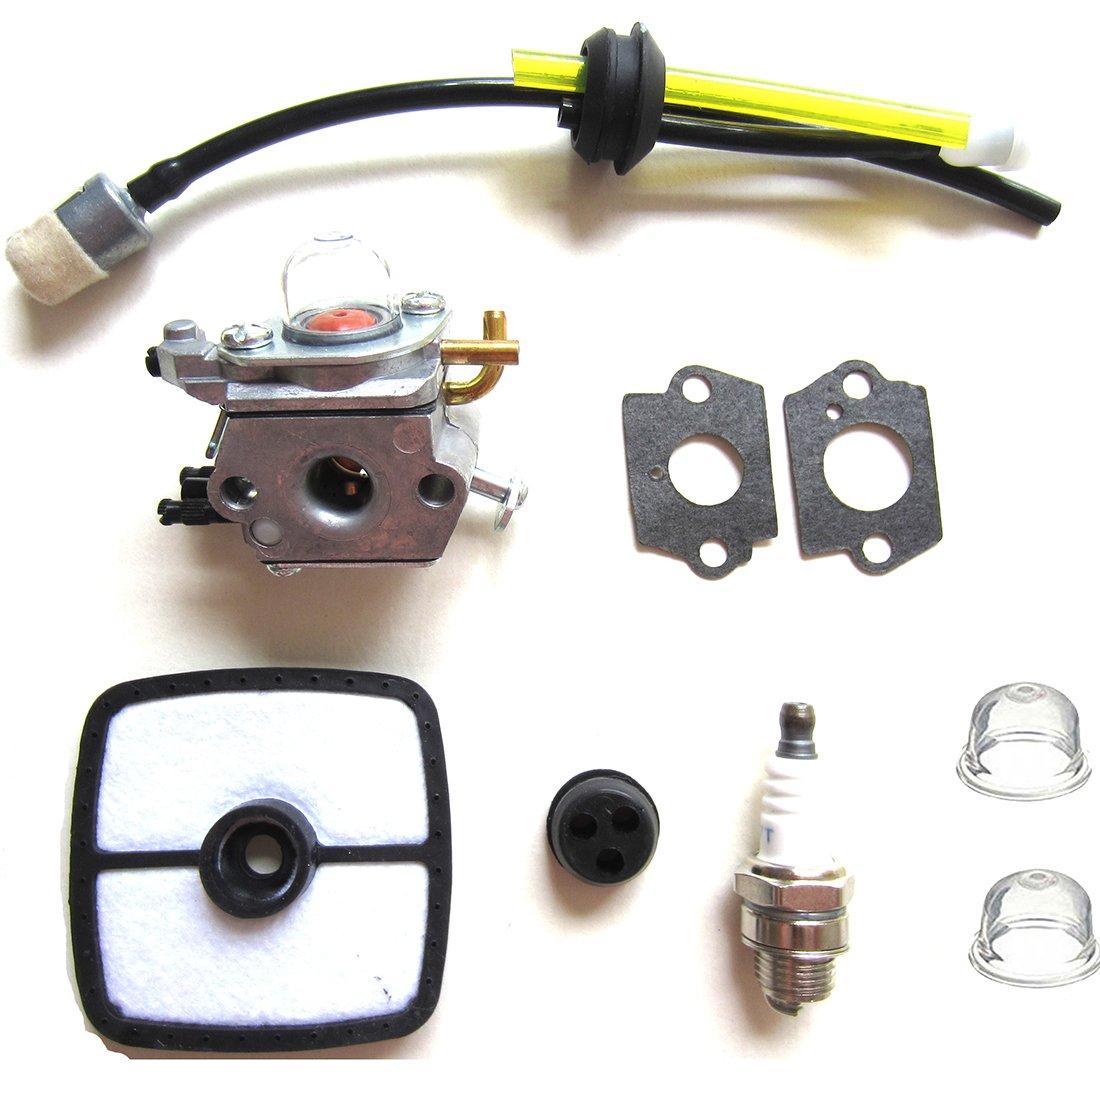 Mckin C1U-K42 Carburetor for Echo PB2100 ES2100 PB2155 Blower C1U-K42B C1U-K42A 12520020563 12520020564 12520020562 12520020561 12520020560 with Fuel Filter Air Filter Fuel Line Spark Plug kit